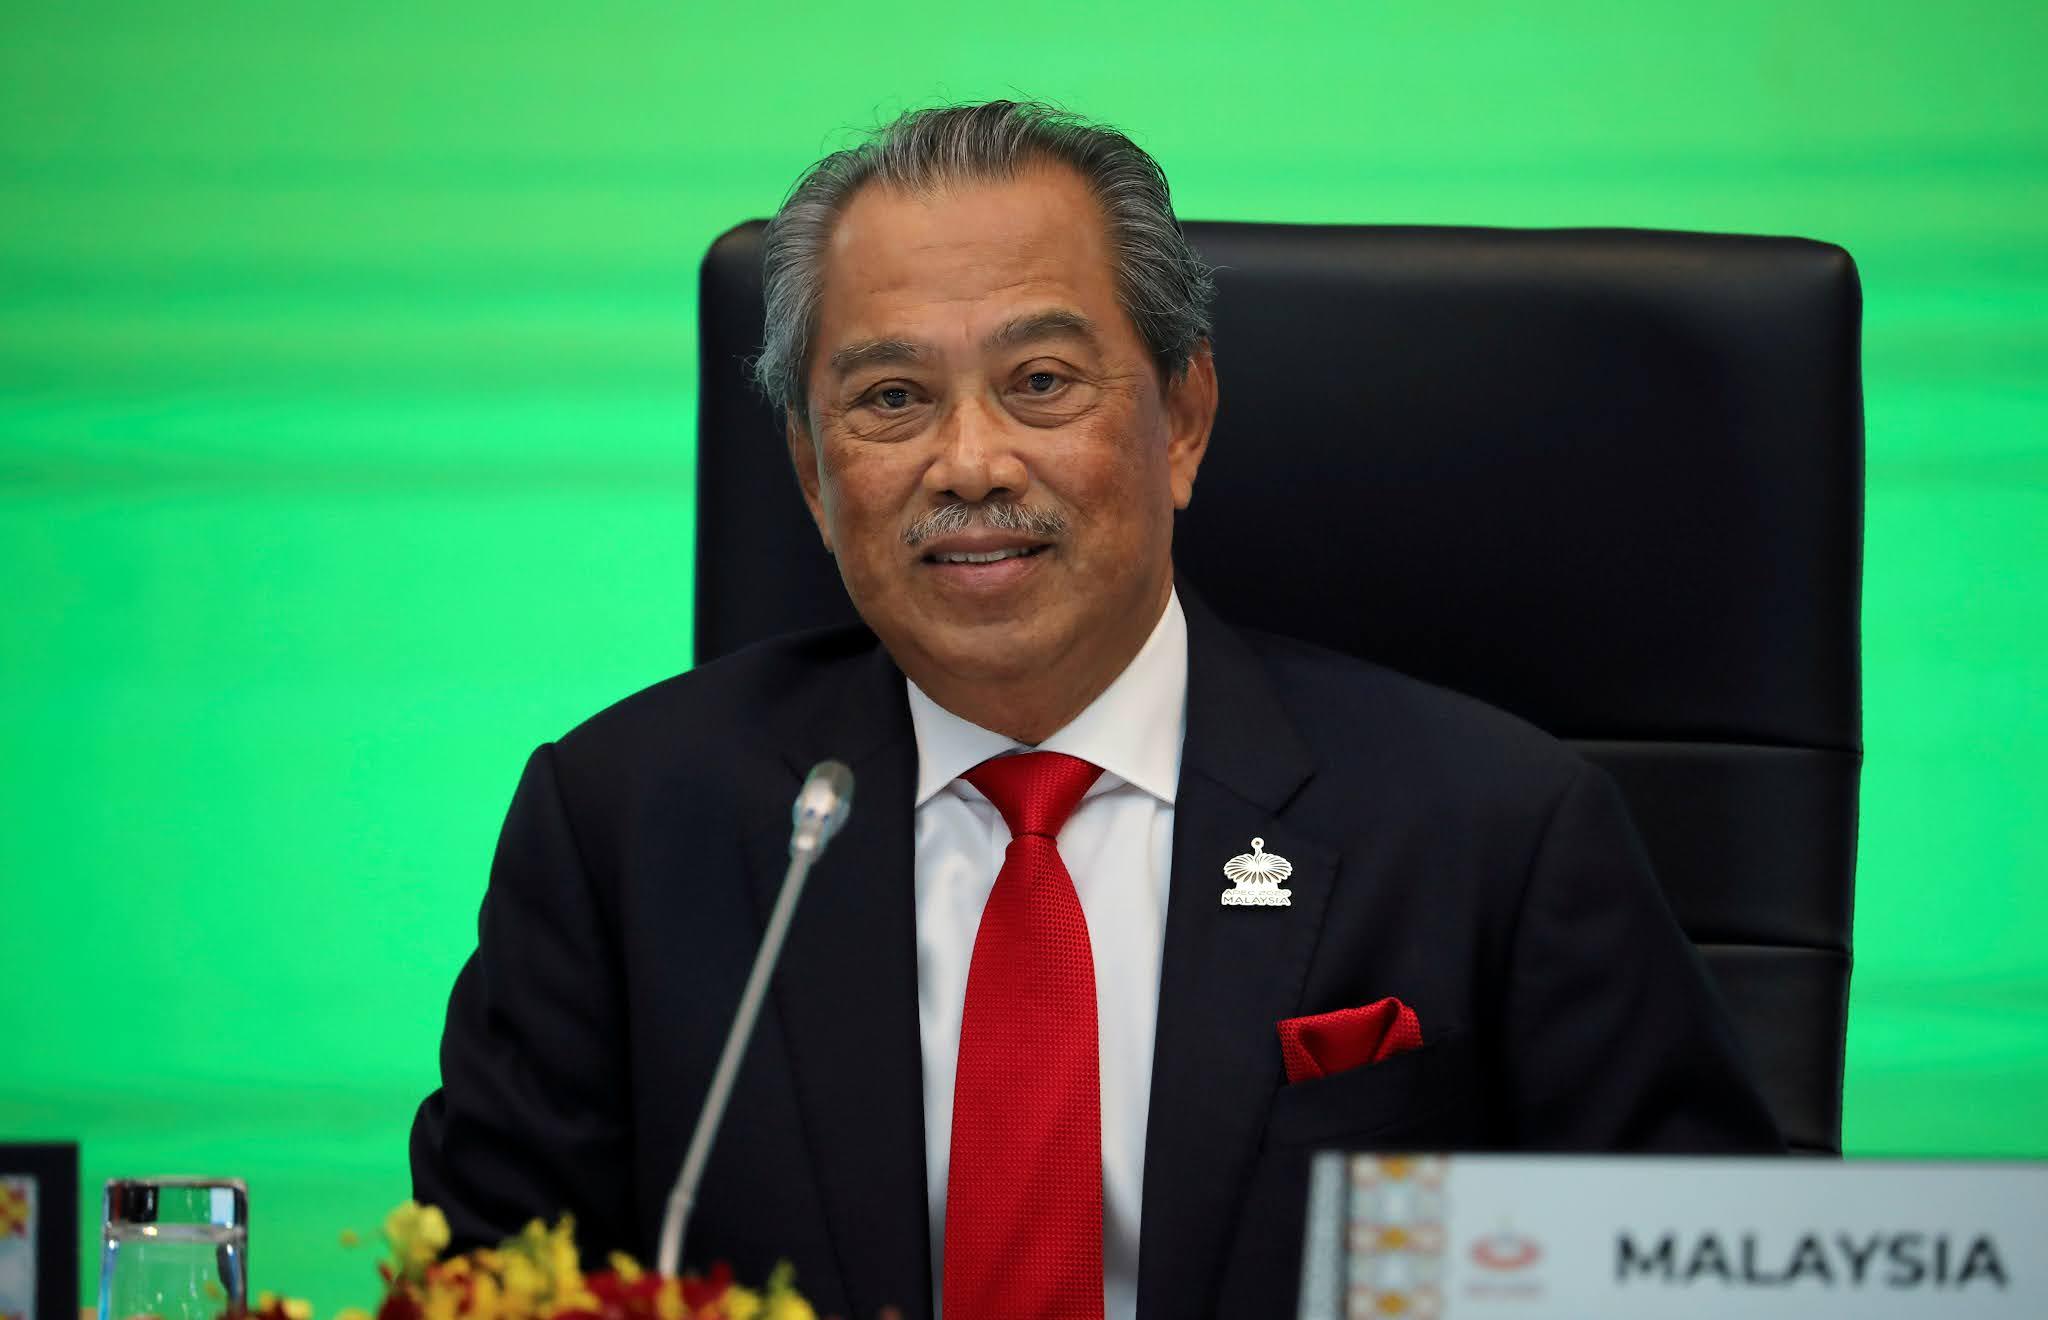 Oposisi Malaysia Tuntut Pengunduran Diri PM Muhyiddin Yassin